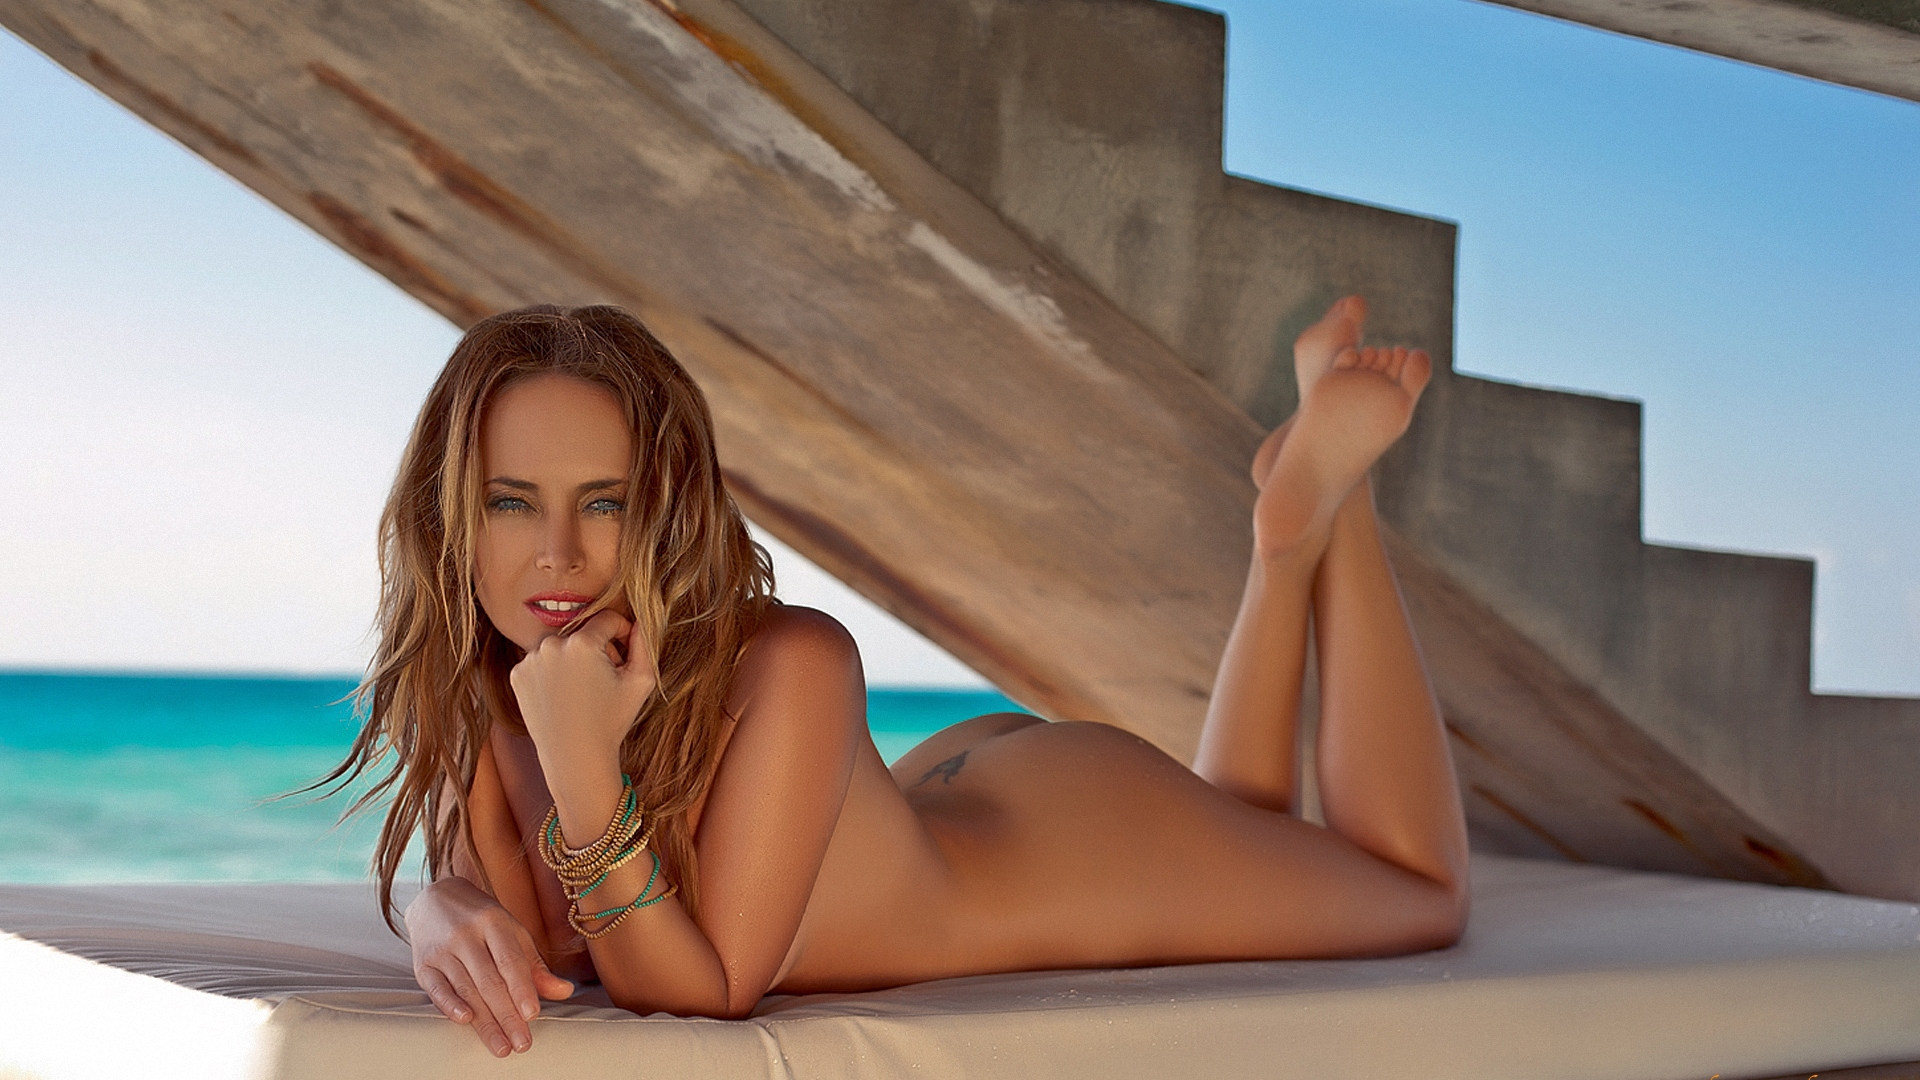 zhanna-friske-erotik-foto